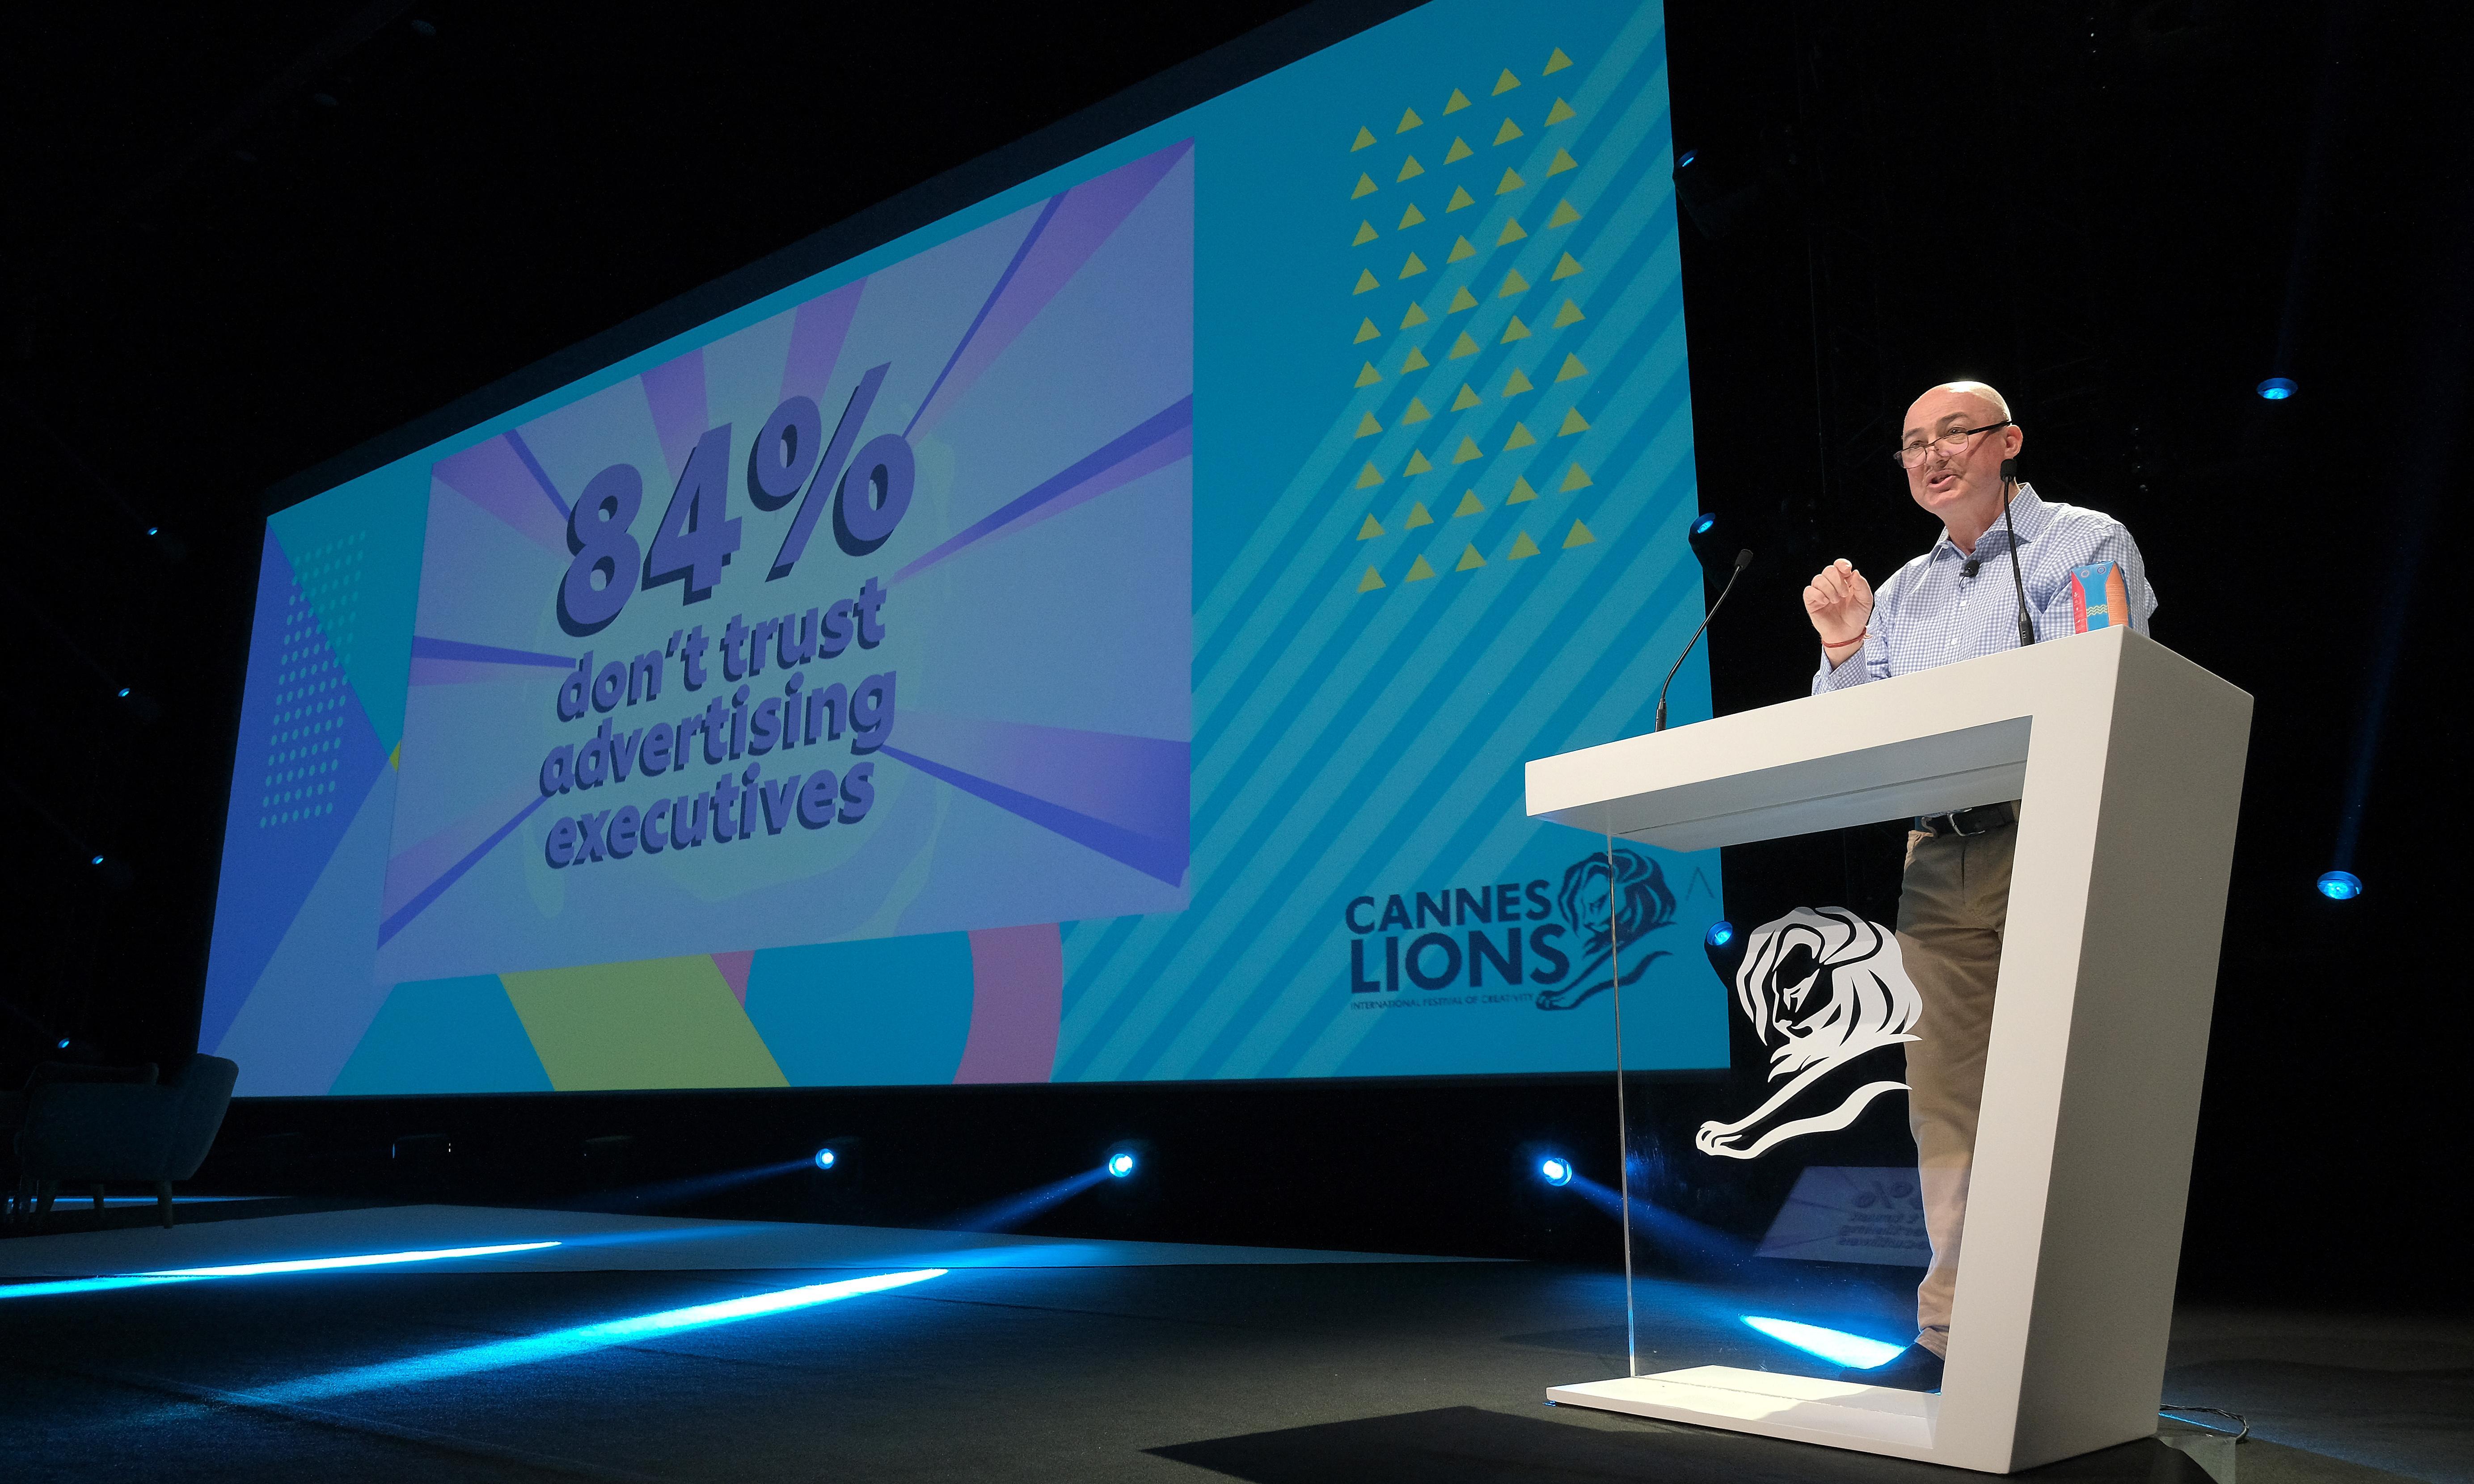 Unilever boss says brands using 'woke-washing' destroy trust